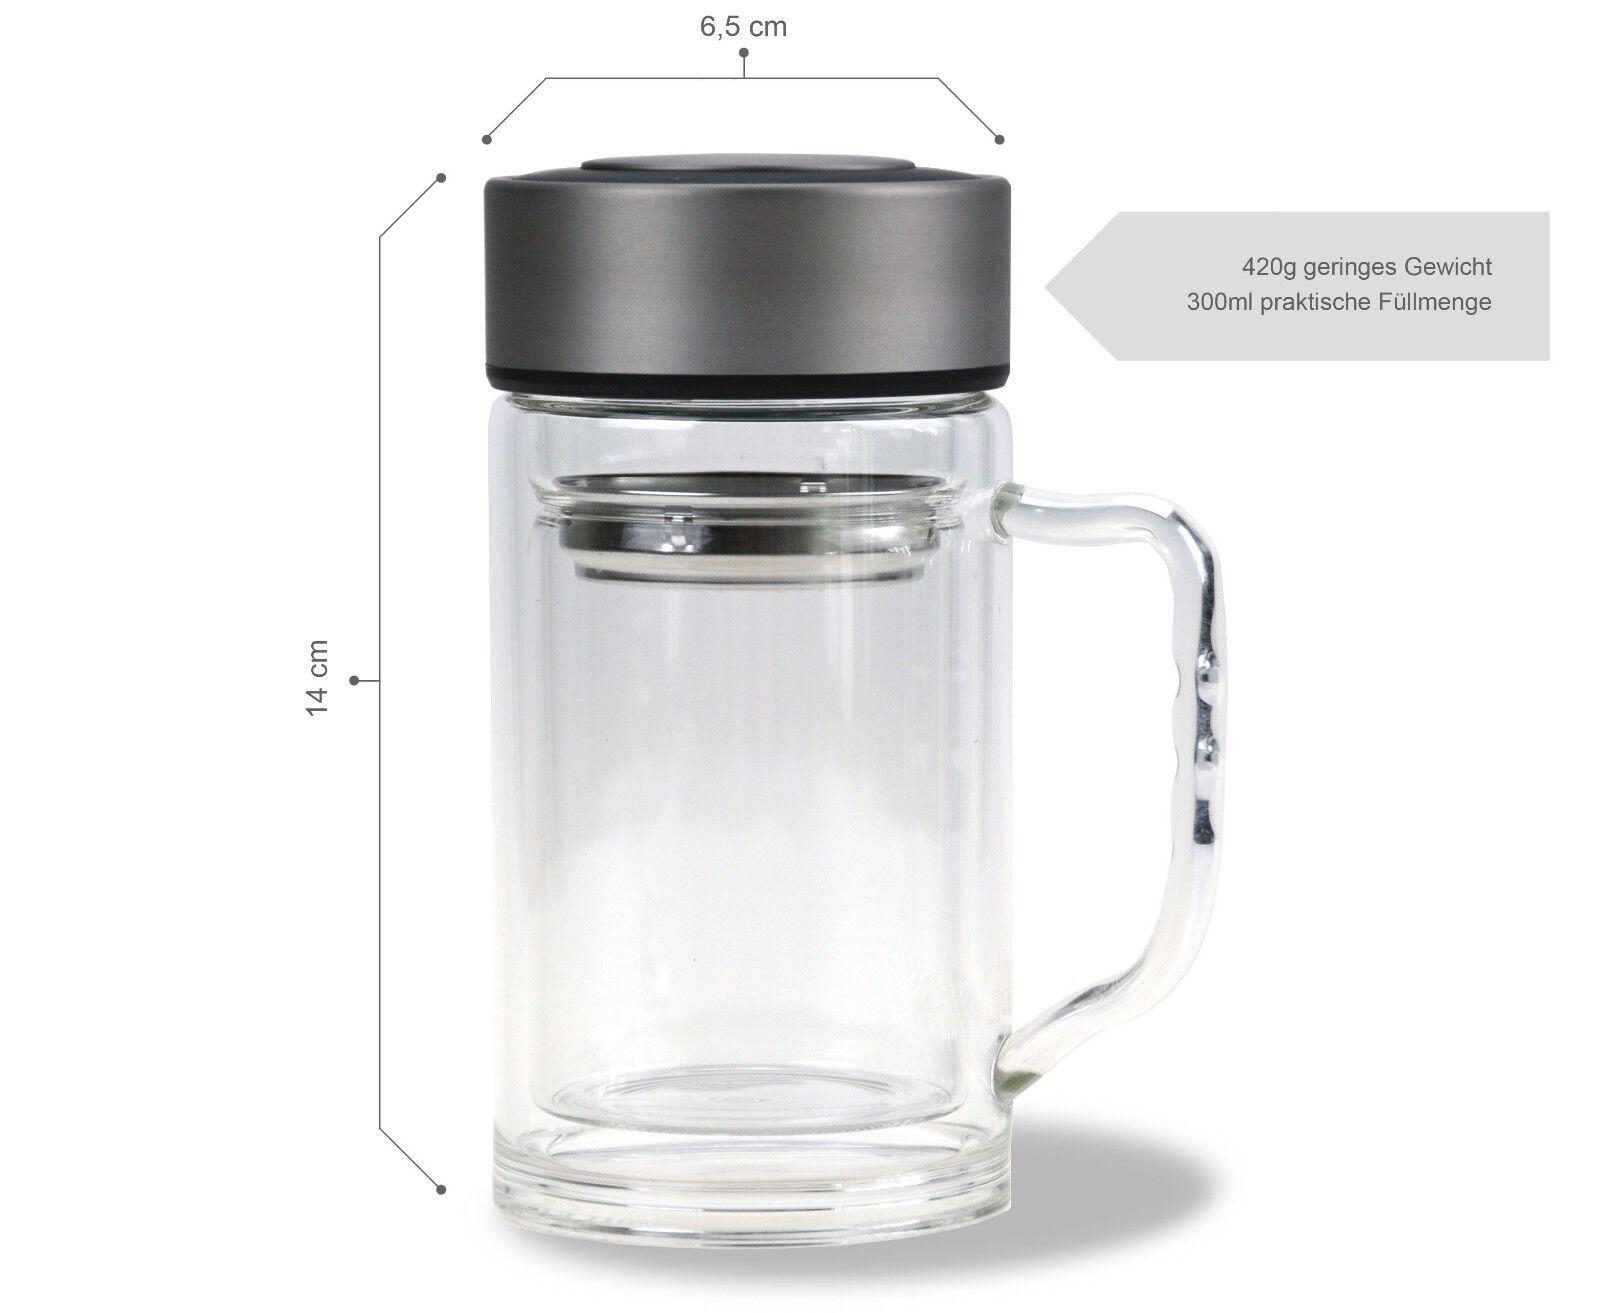 Teebereiter mit Henkel / 300 ml / 100% dicht / Tee-Glas doppelwandig / to go